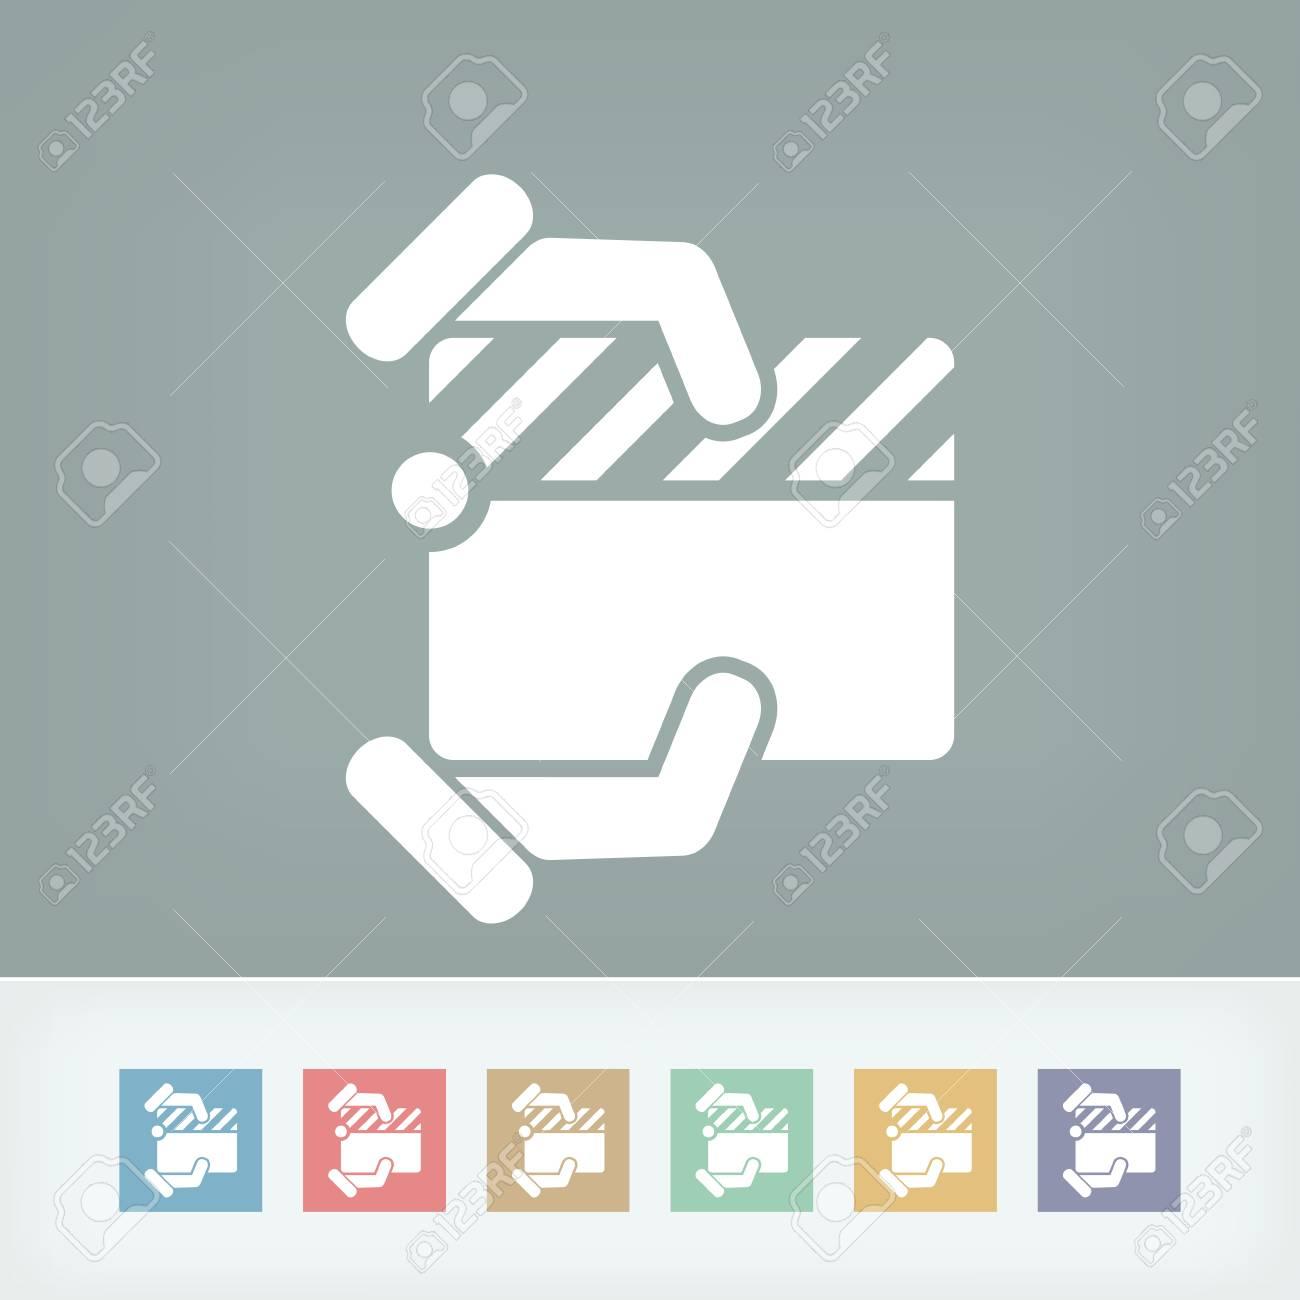 Clapboard concept icon Stock Vector - 27149064